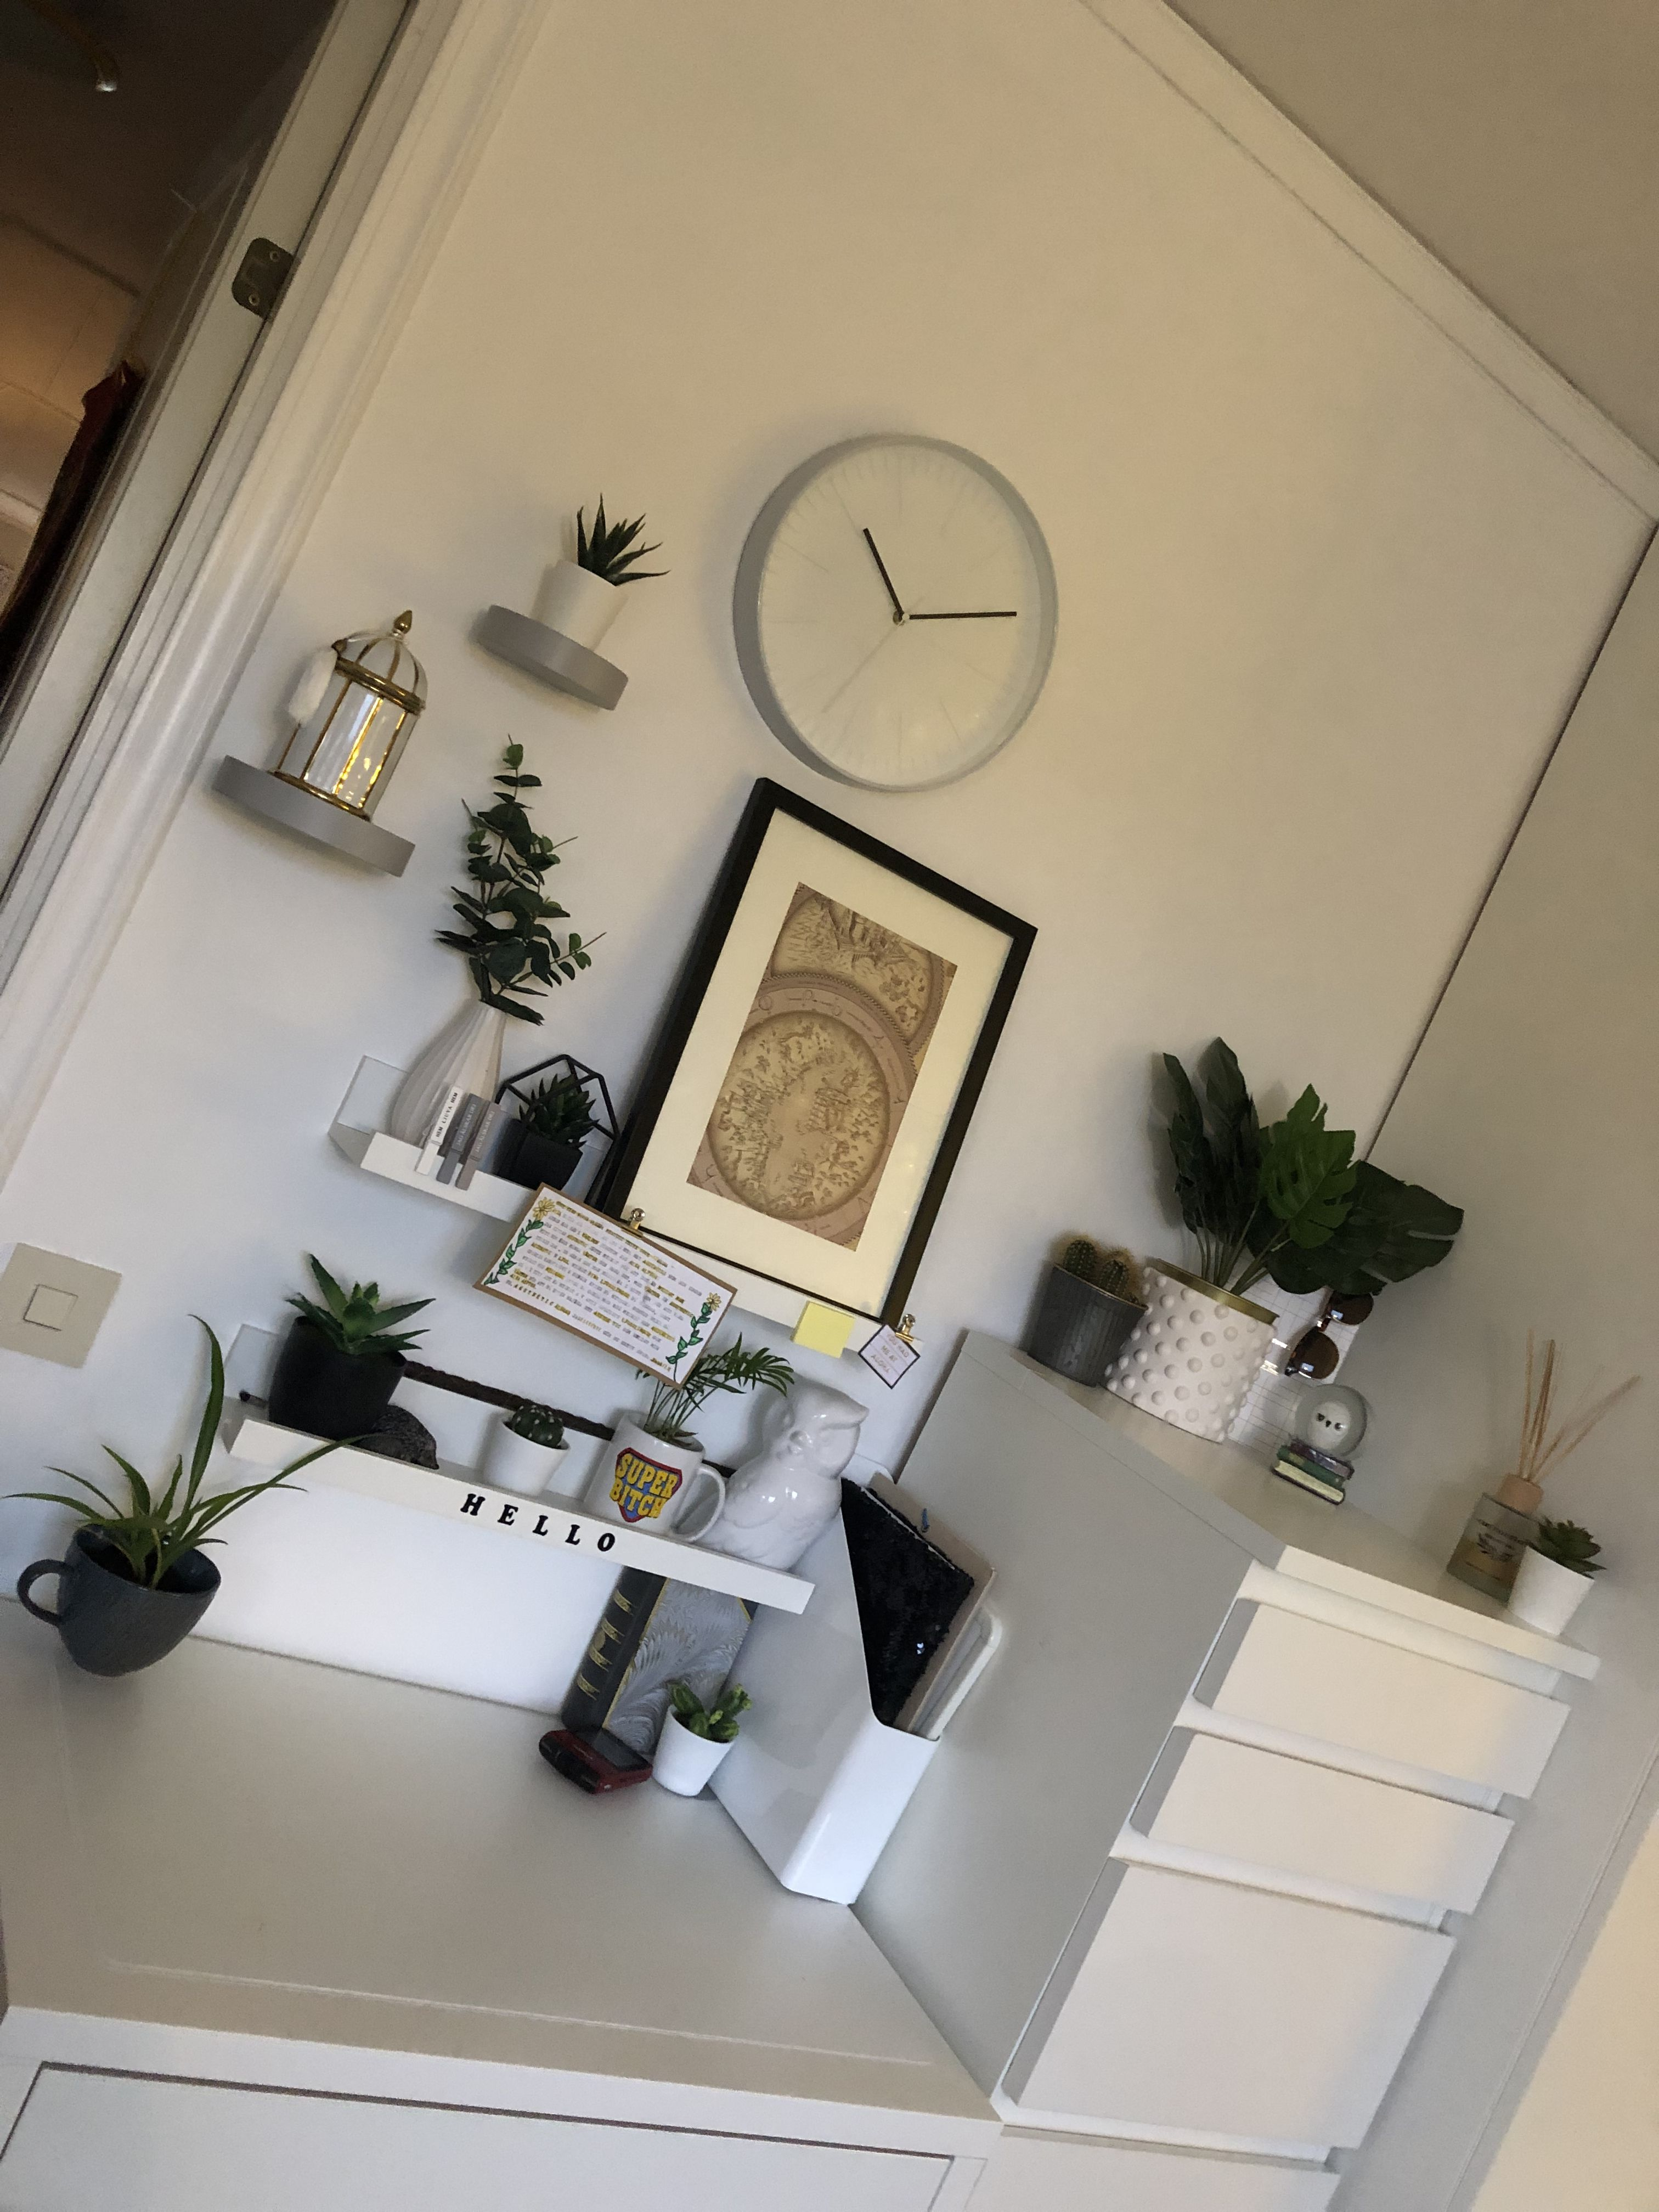 My Aesthetic And Tumblr Room Tumblr Room Decor Cute Room Ideas Tumblr Rooms